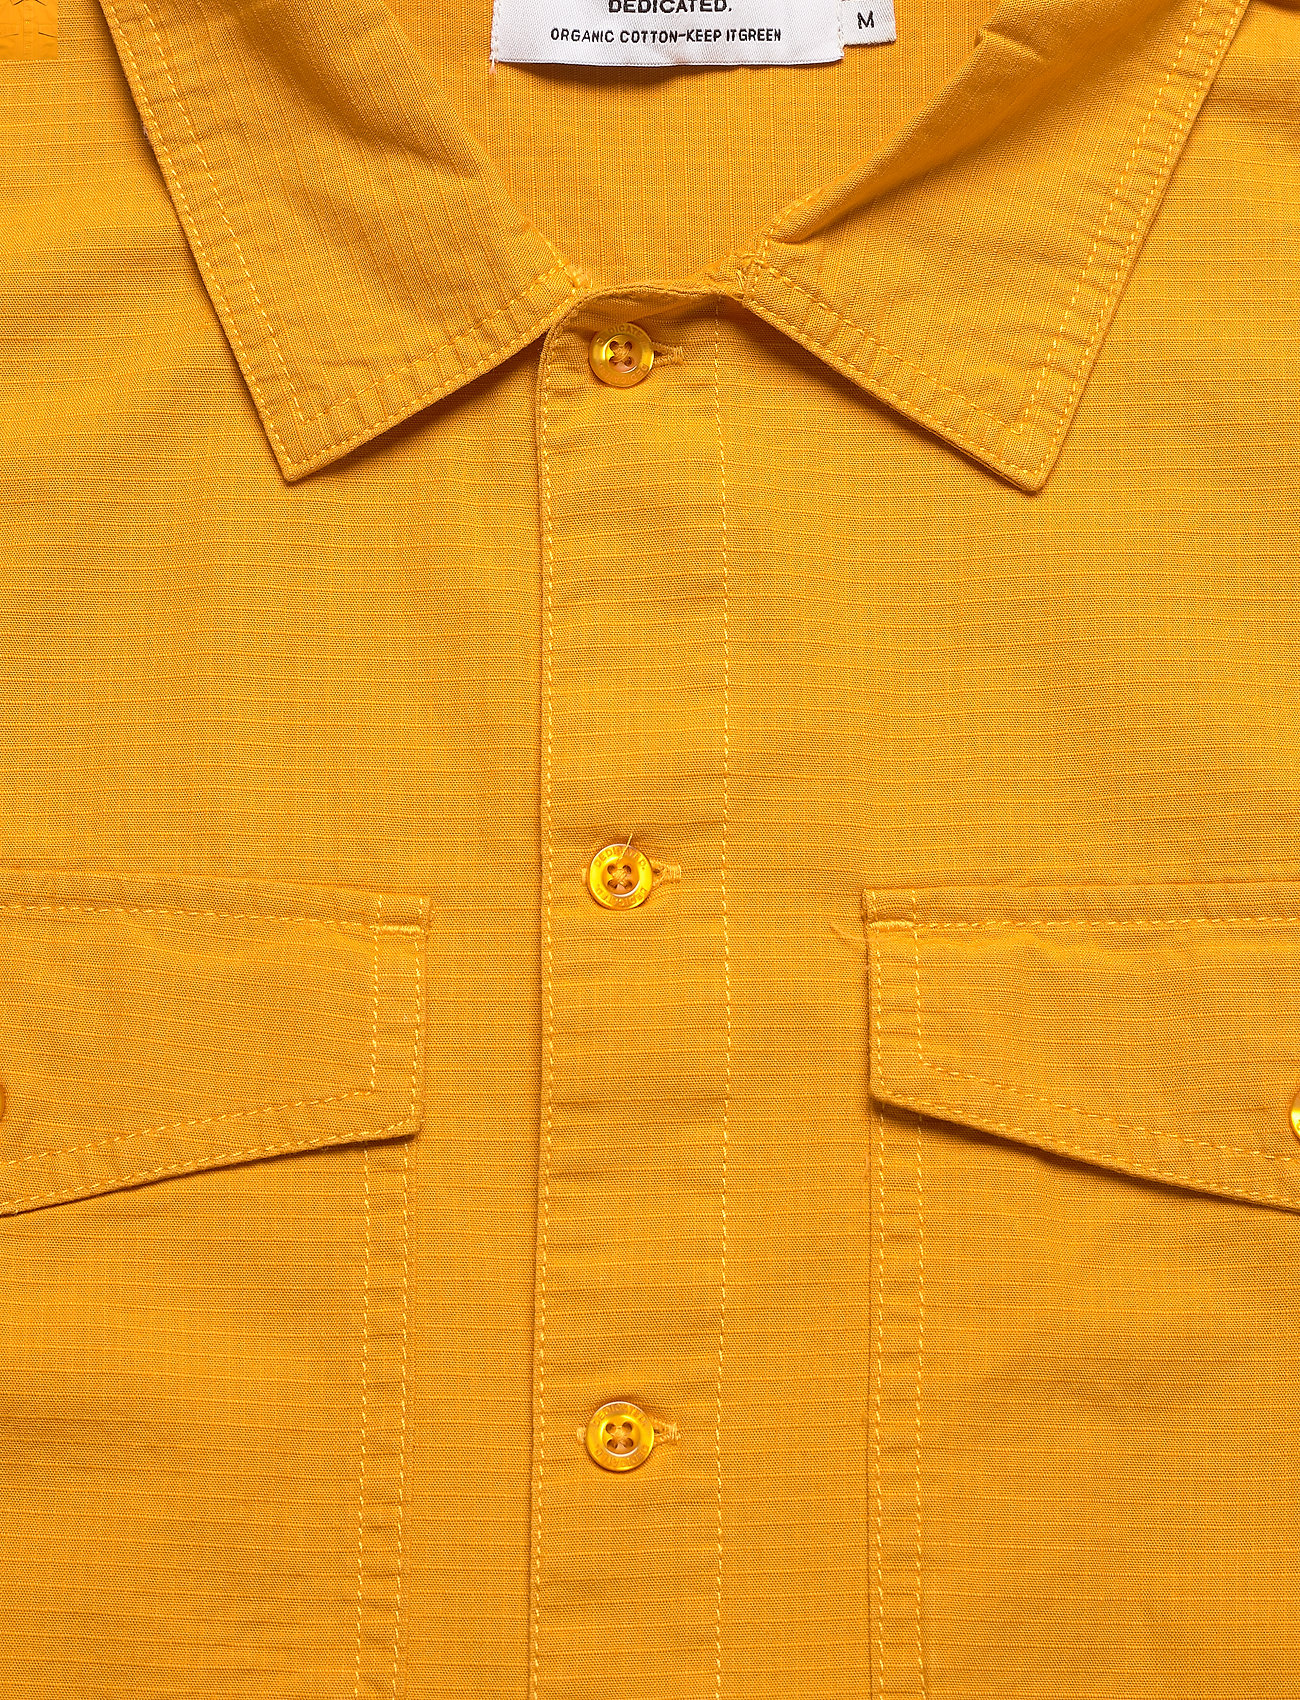 DEDICATED - Shirt Edsbyn Golden Yellow - chemises à carreaux - golden yellow - 2